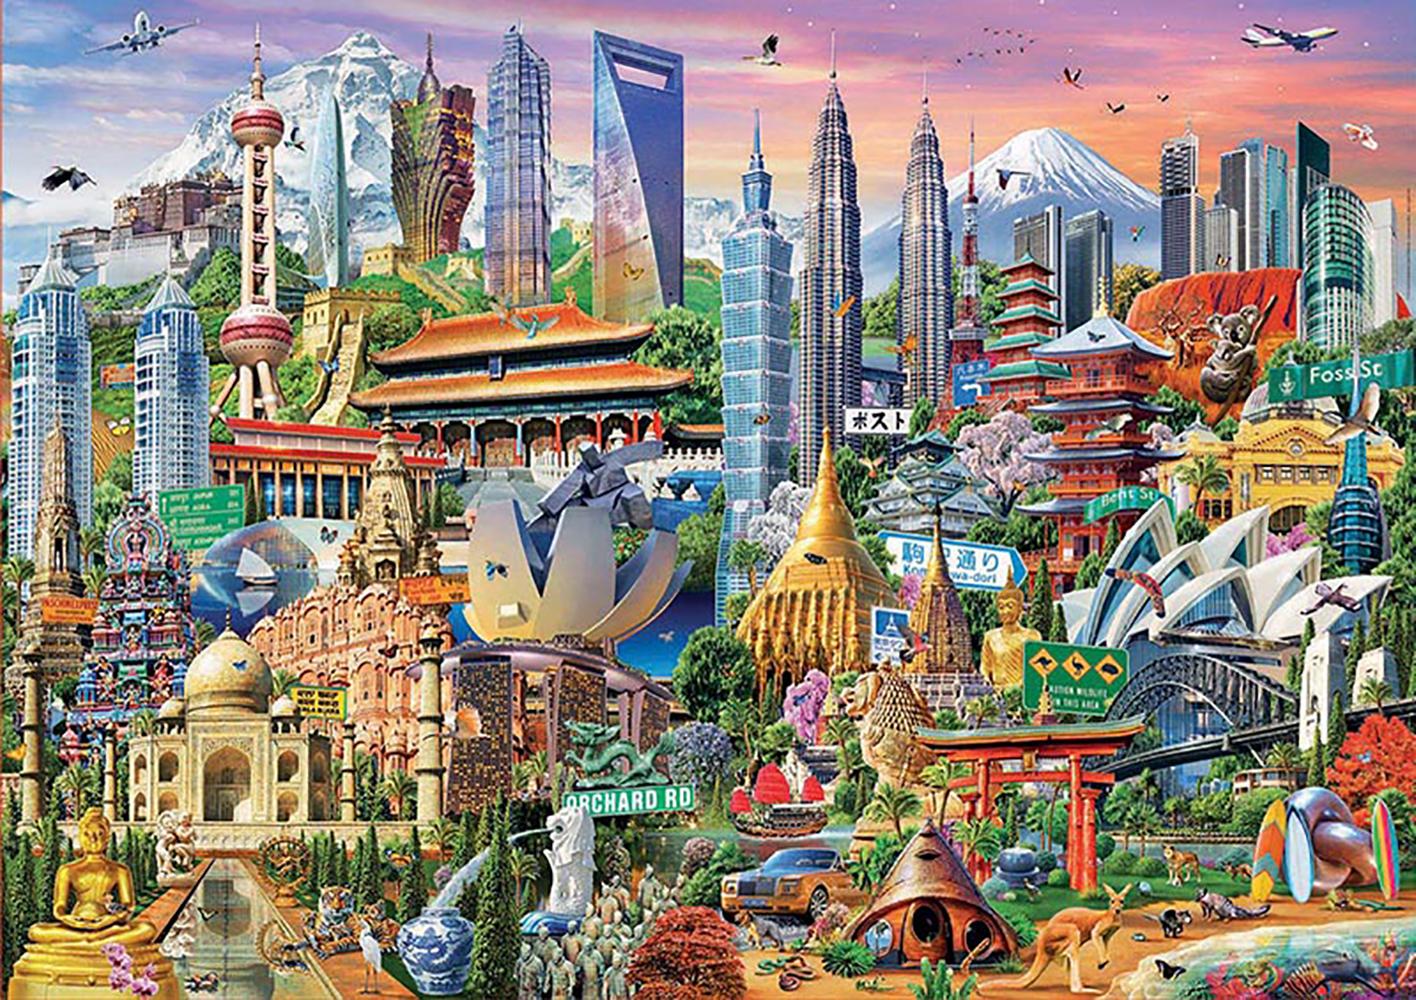 Puzzle 1500 pieces - Asia Landmarks